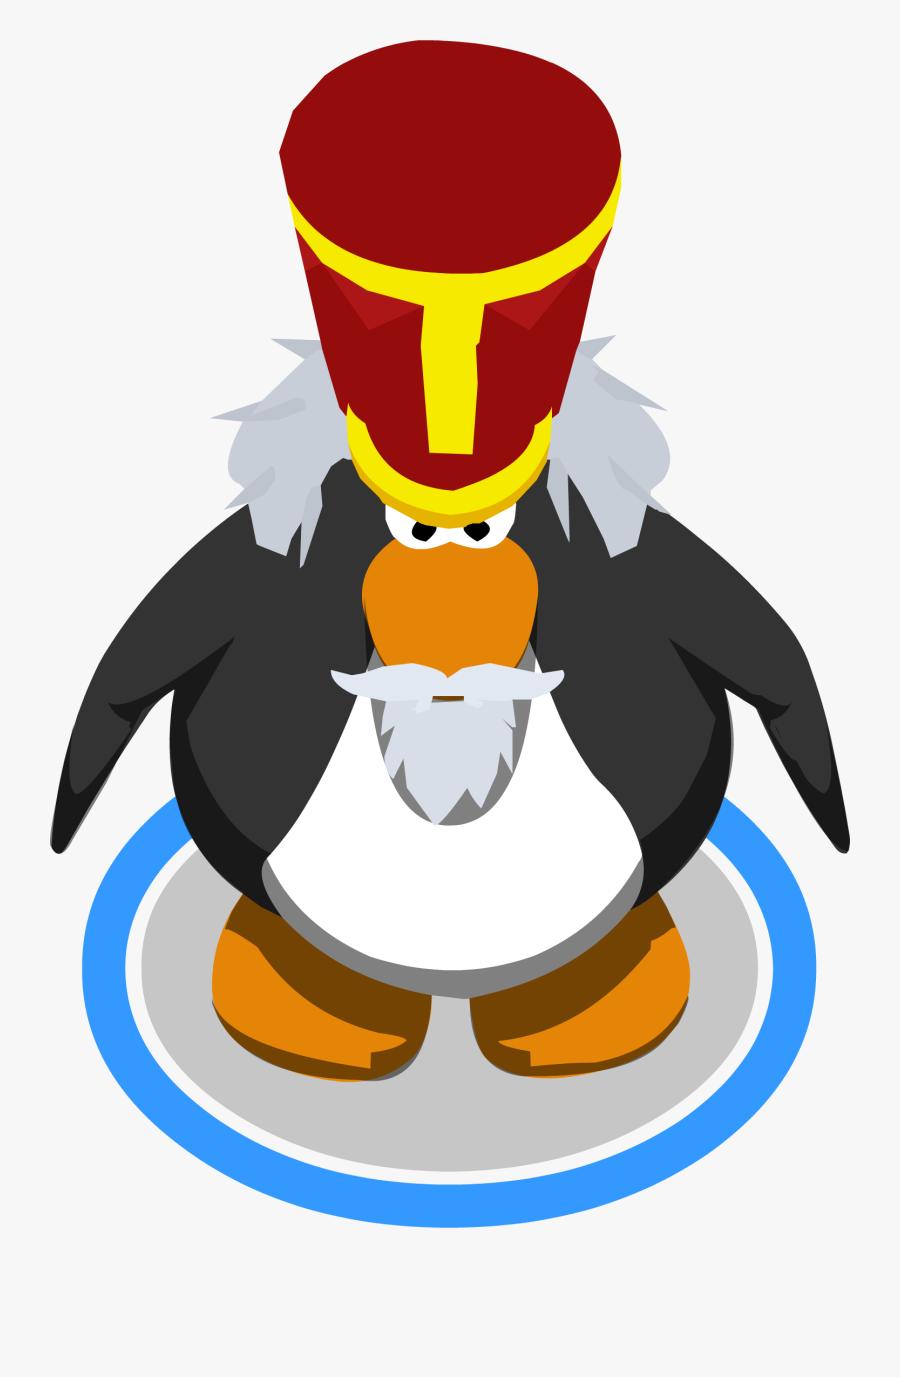 Nutcracker Hat In-game - Club Penguin Kermit Costume, Transparent Clipart